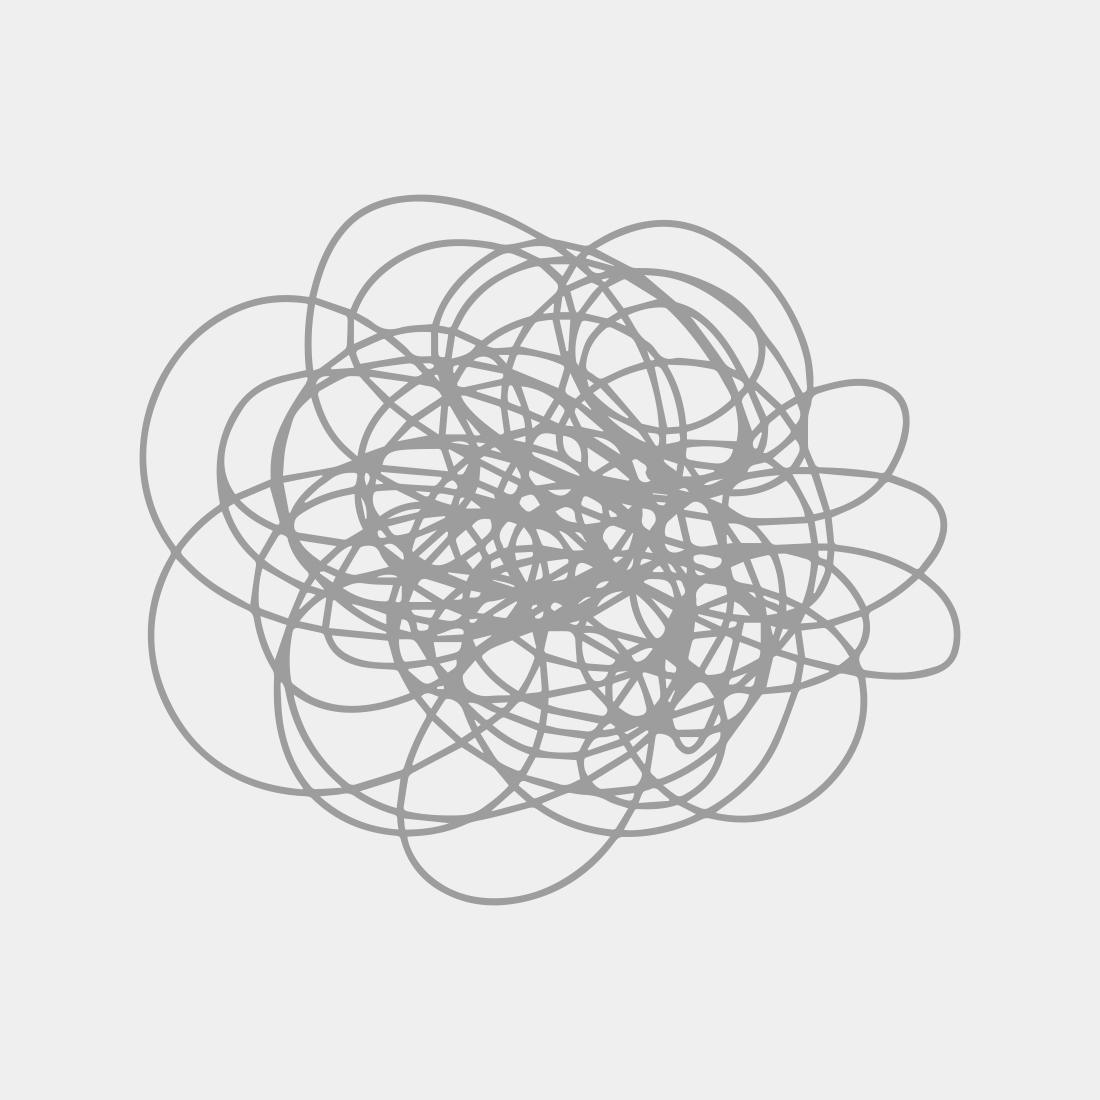 Albert Irvin OBE RA Untitled opus w.1 (framed)